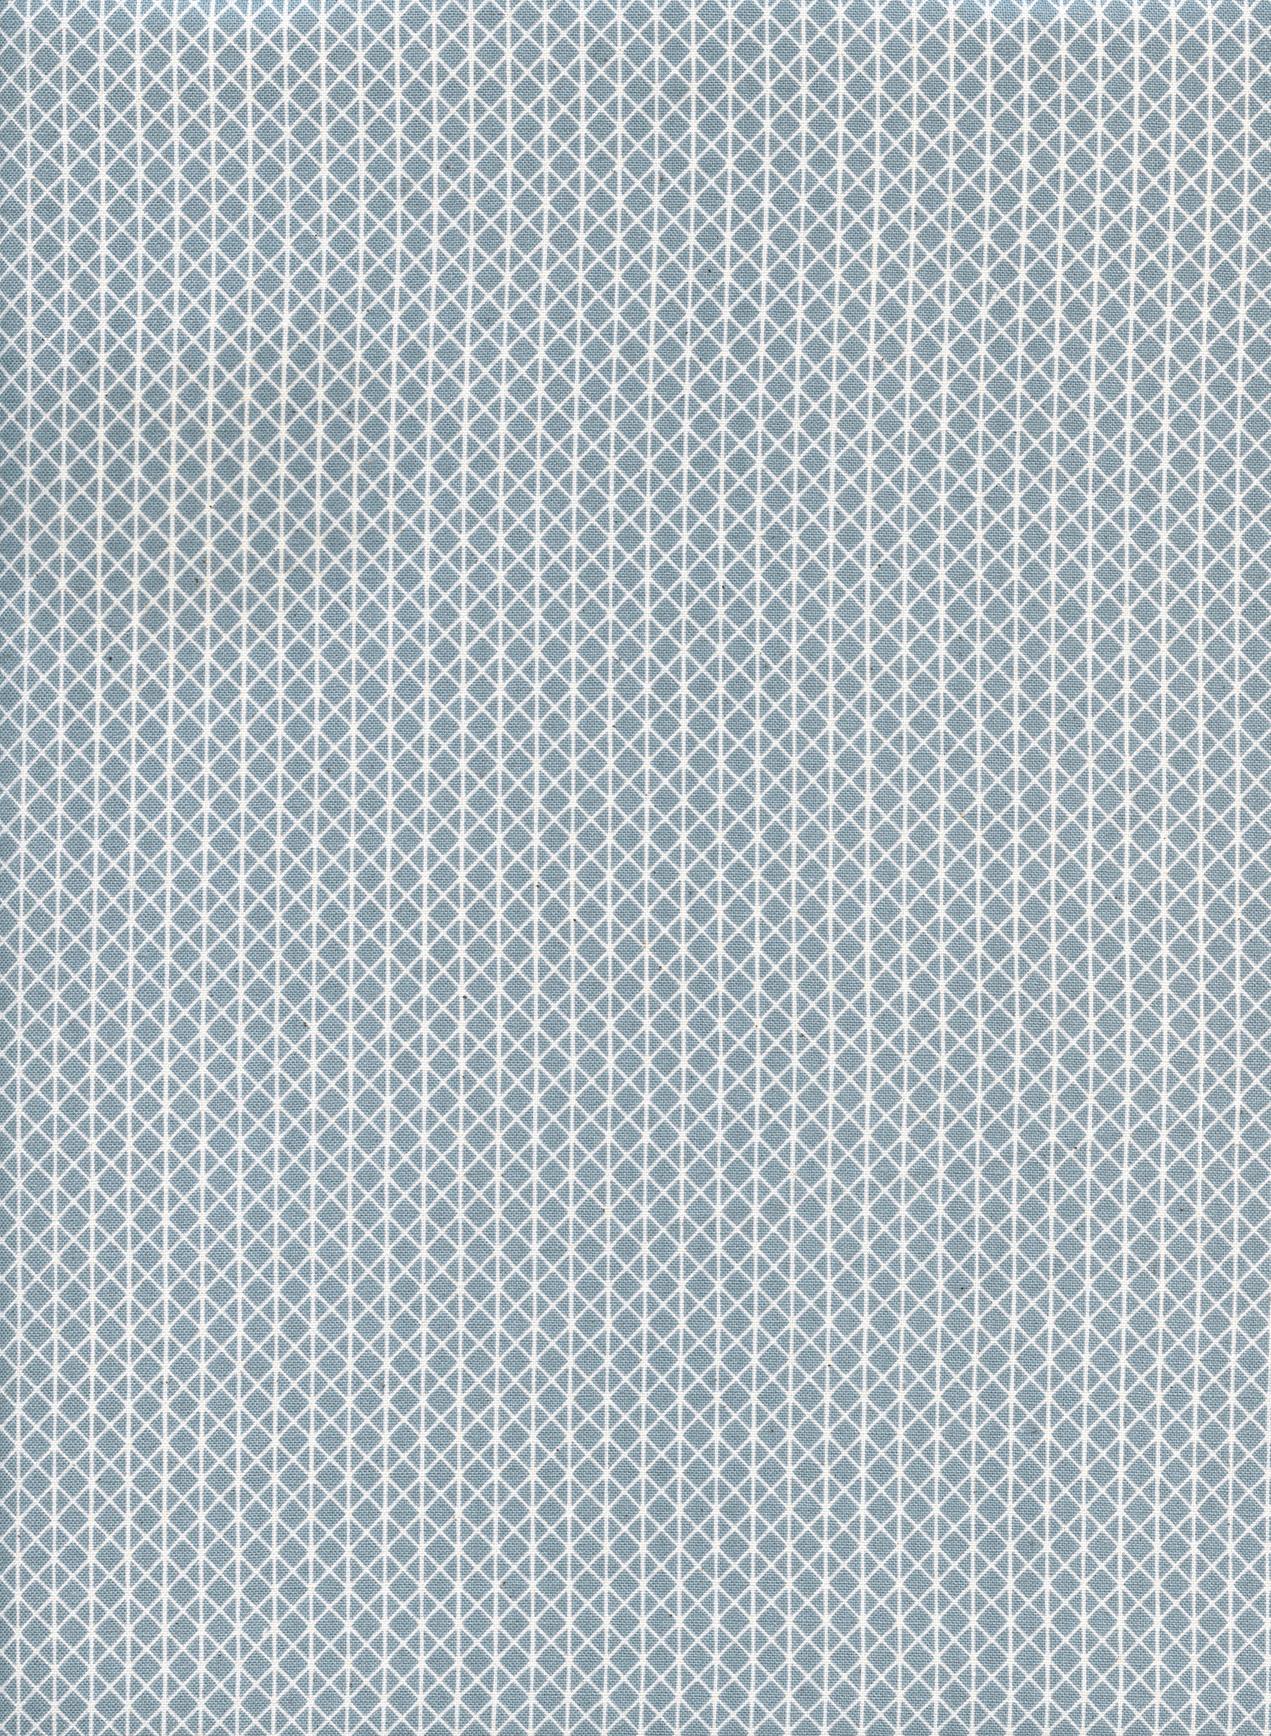 Cotton+Steel Basics - Netorious (Filler Paper)